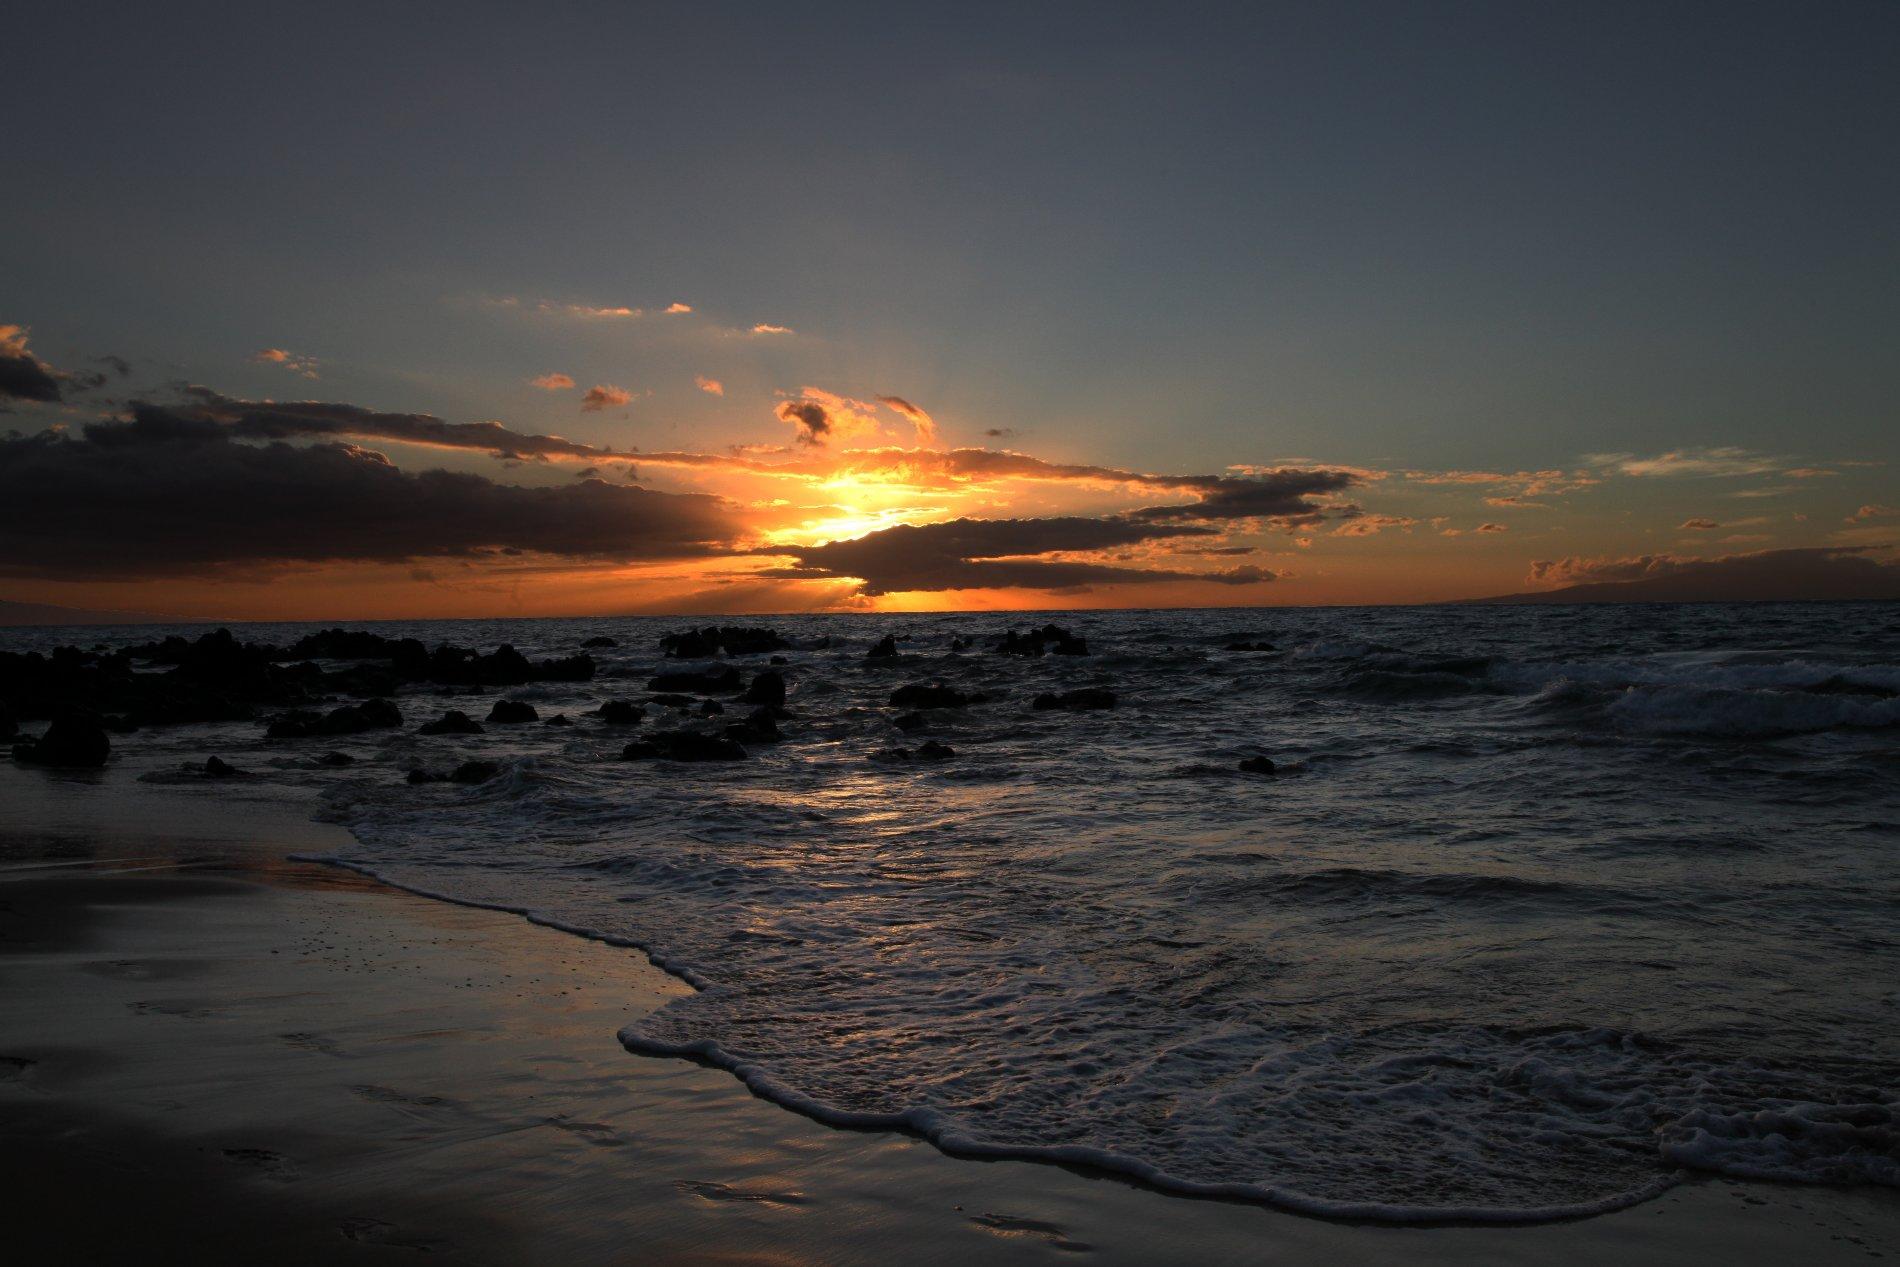 Sunset from Keawakapu.jpg